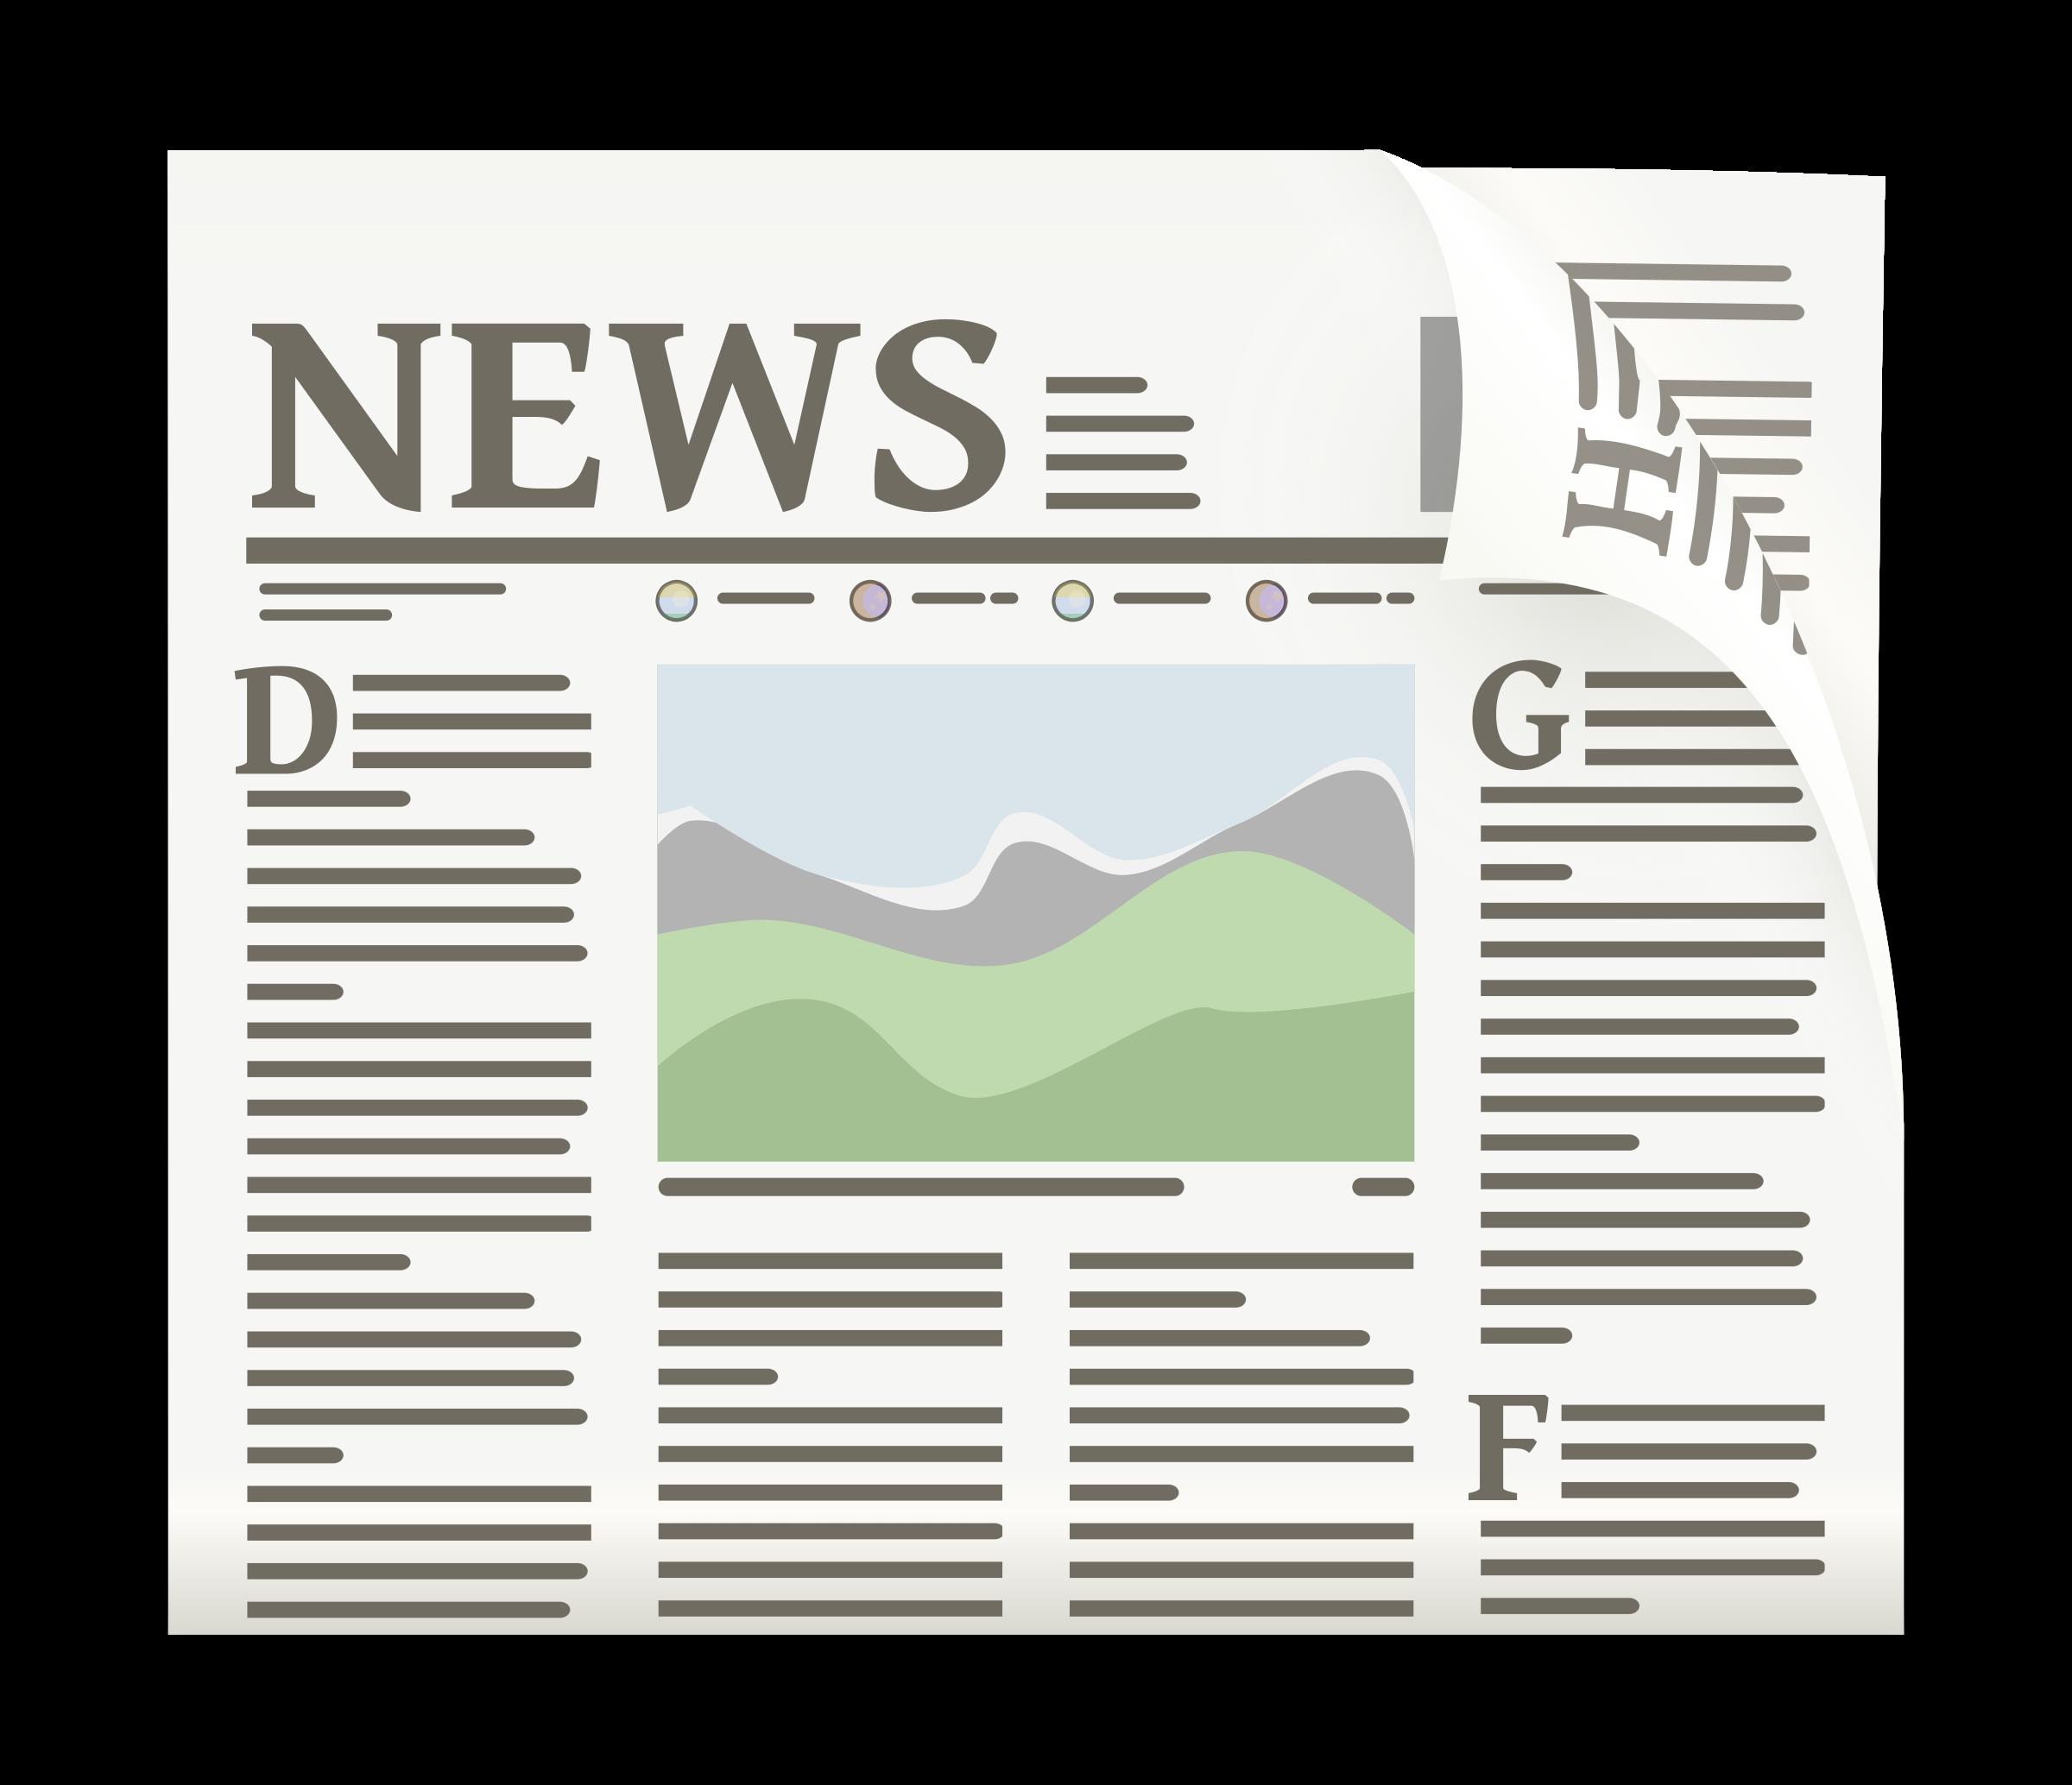 Newspaper clipart newspapaer. News big image png